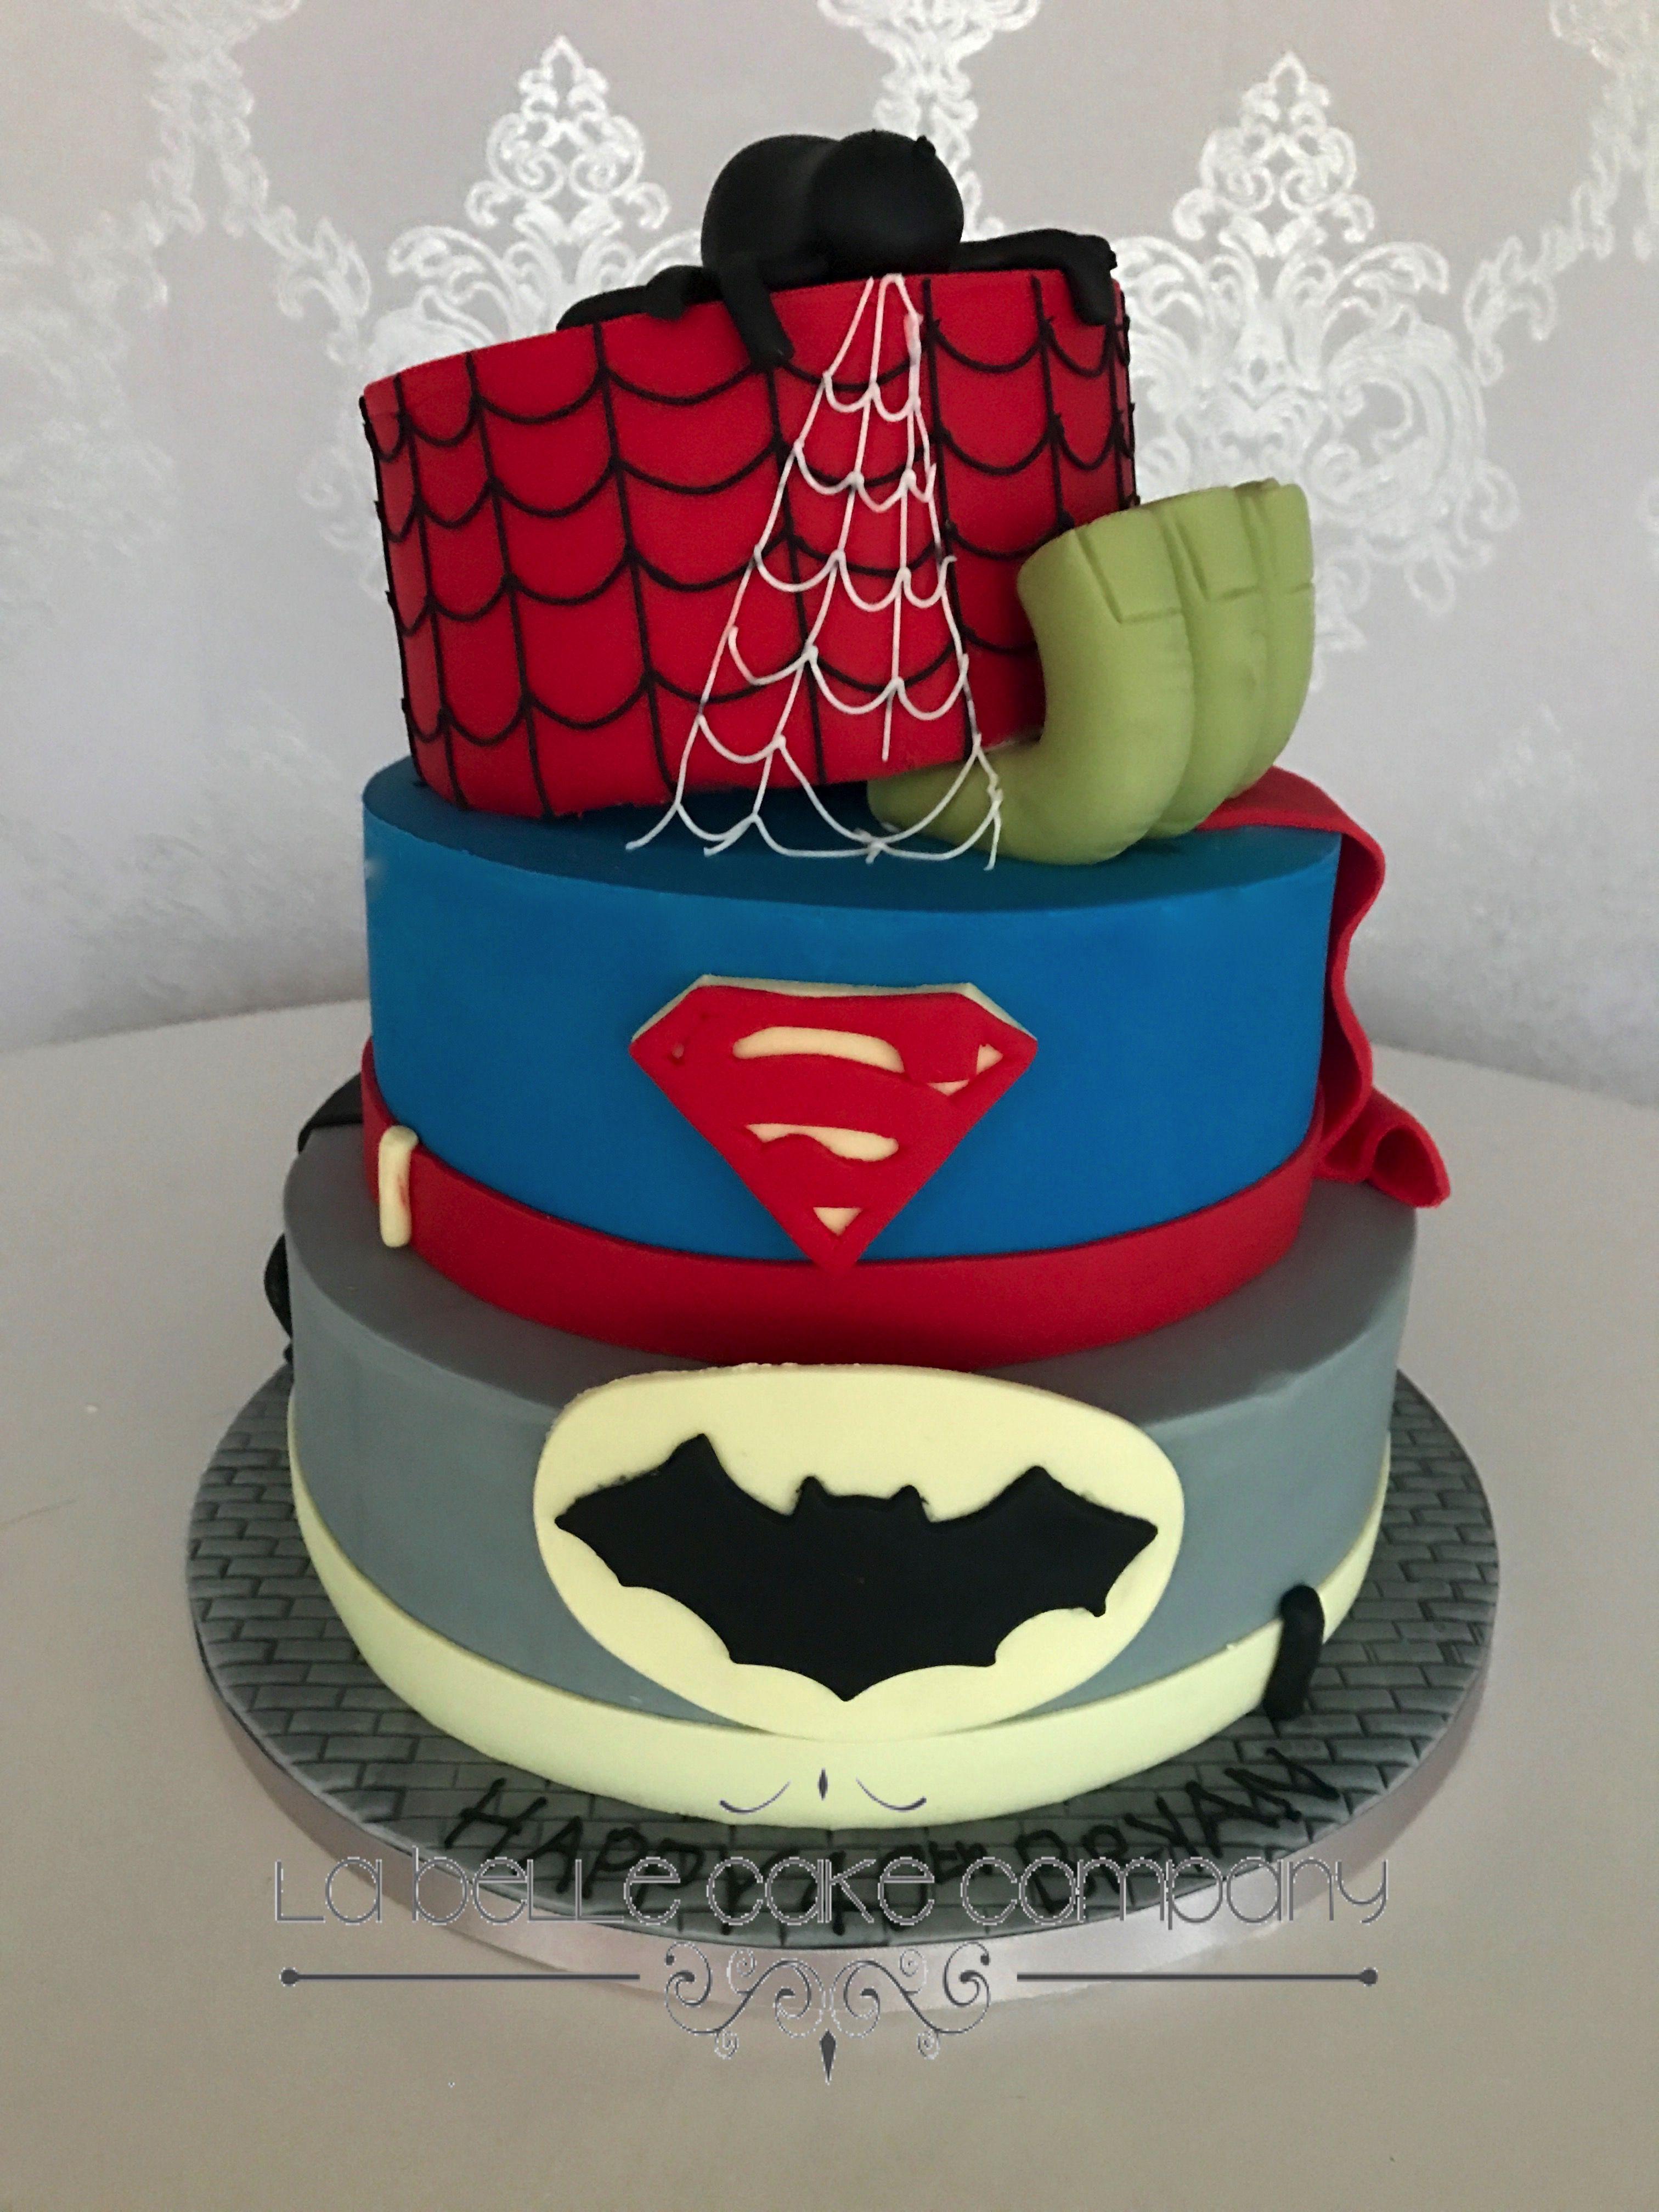 Birthday Cakes Bedfordshire Belle cake, Cake, Cool